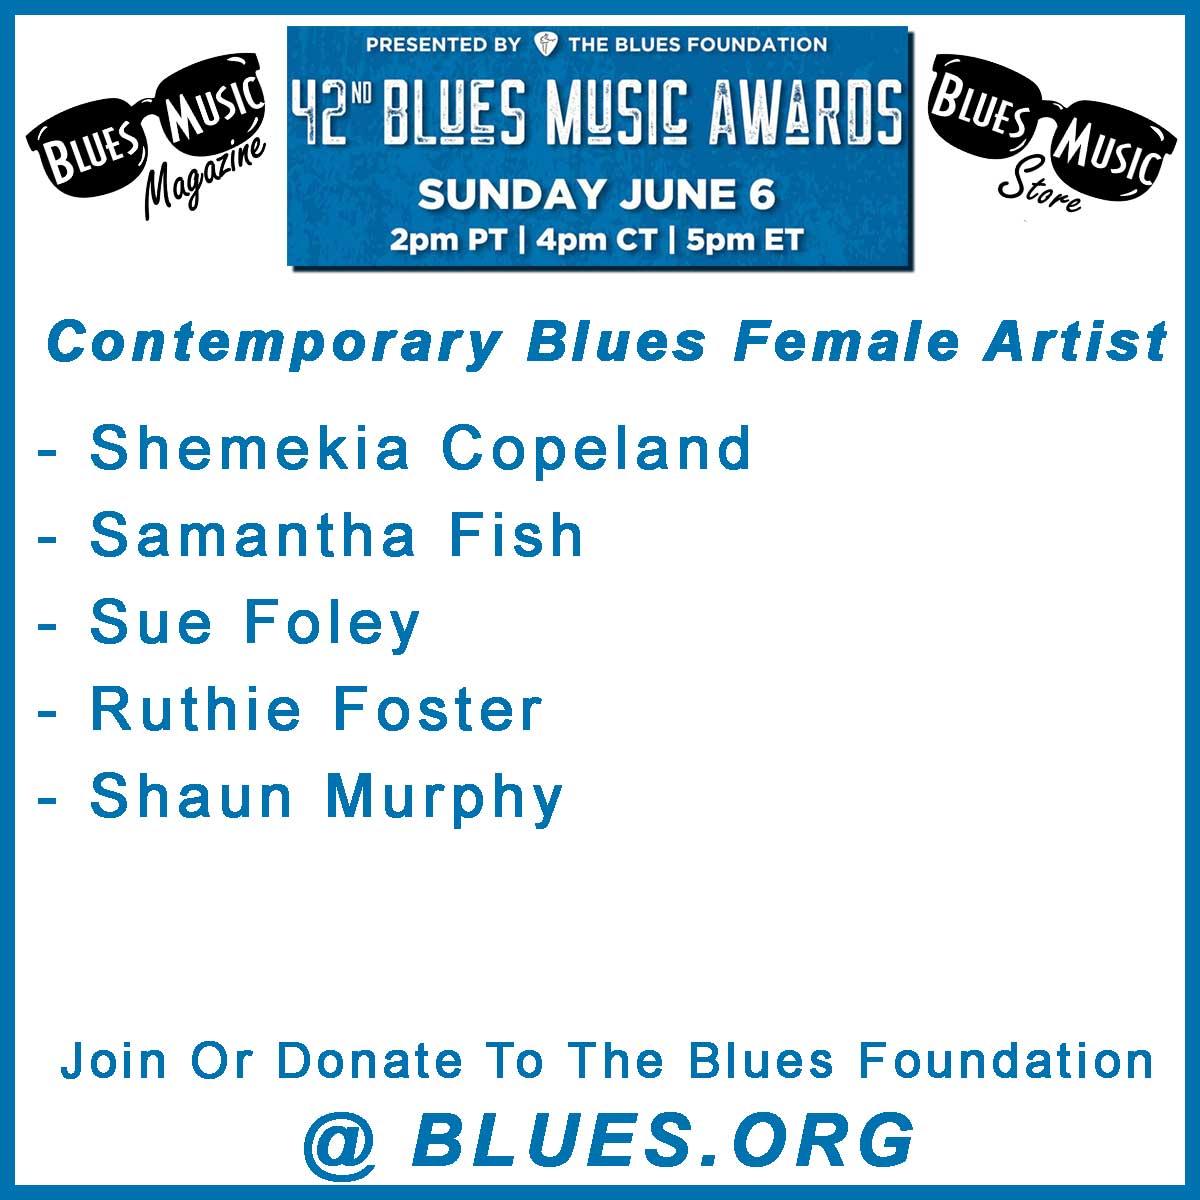 13-contemporary-blues-female-artist.jpg